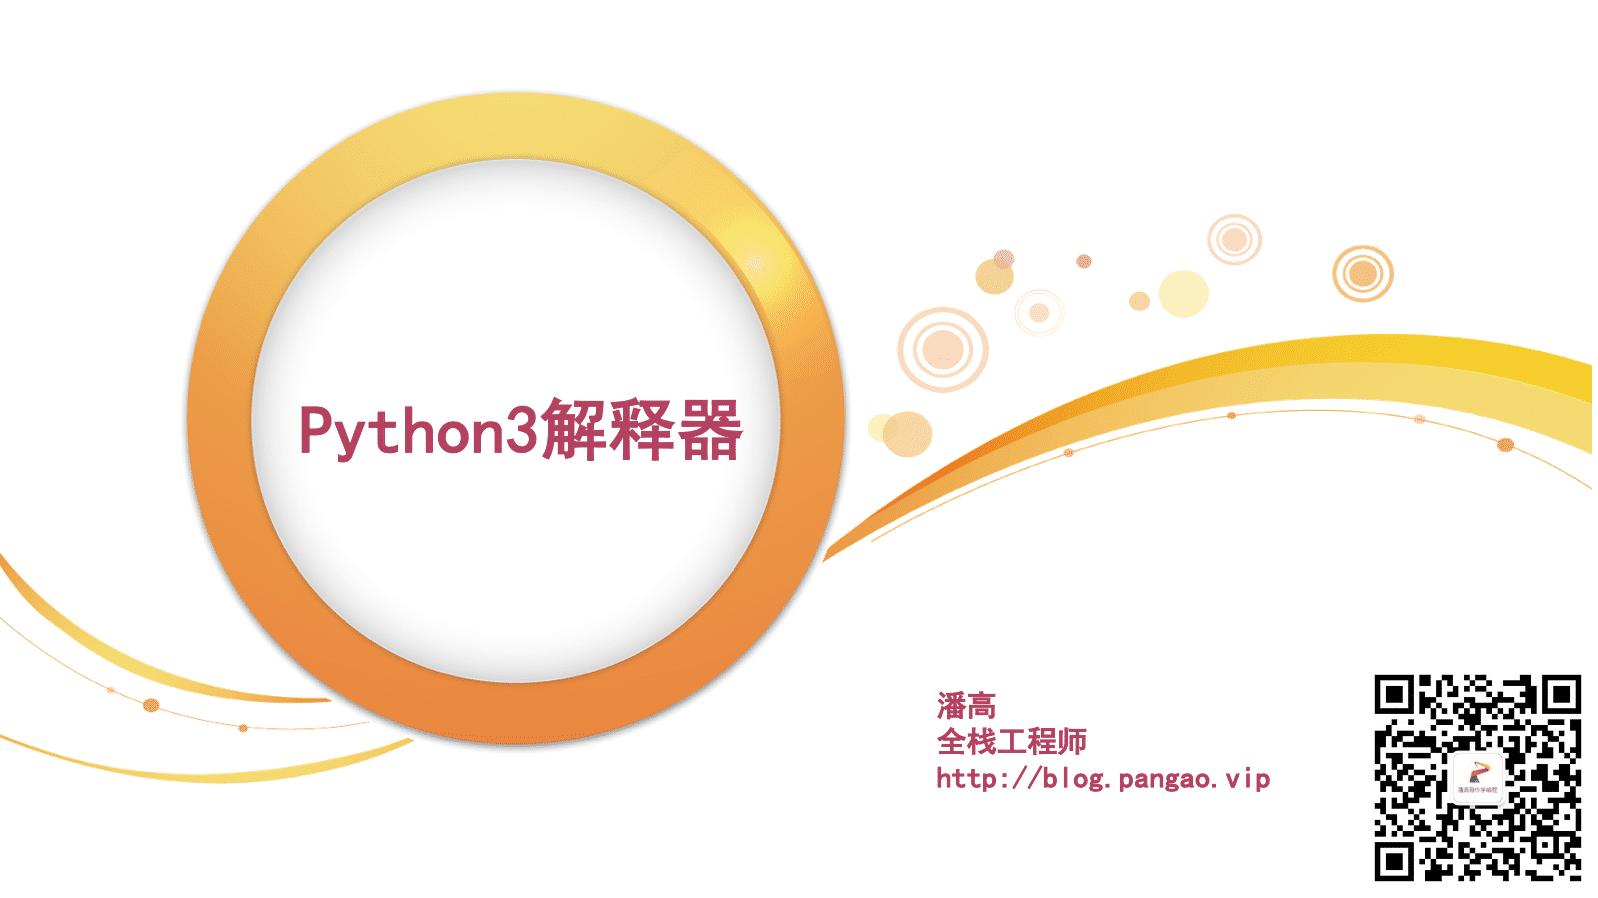 Python3解释器-Python入门到精通